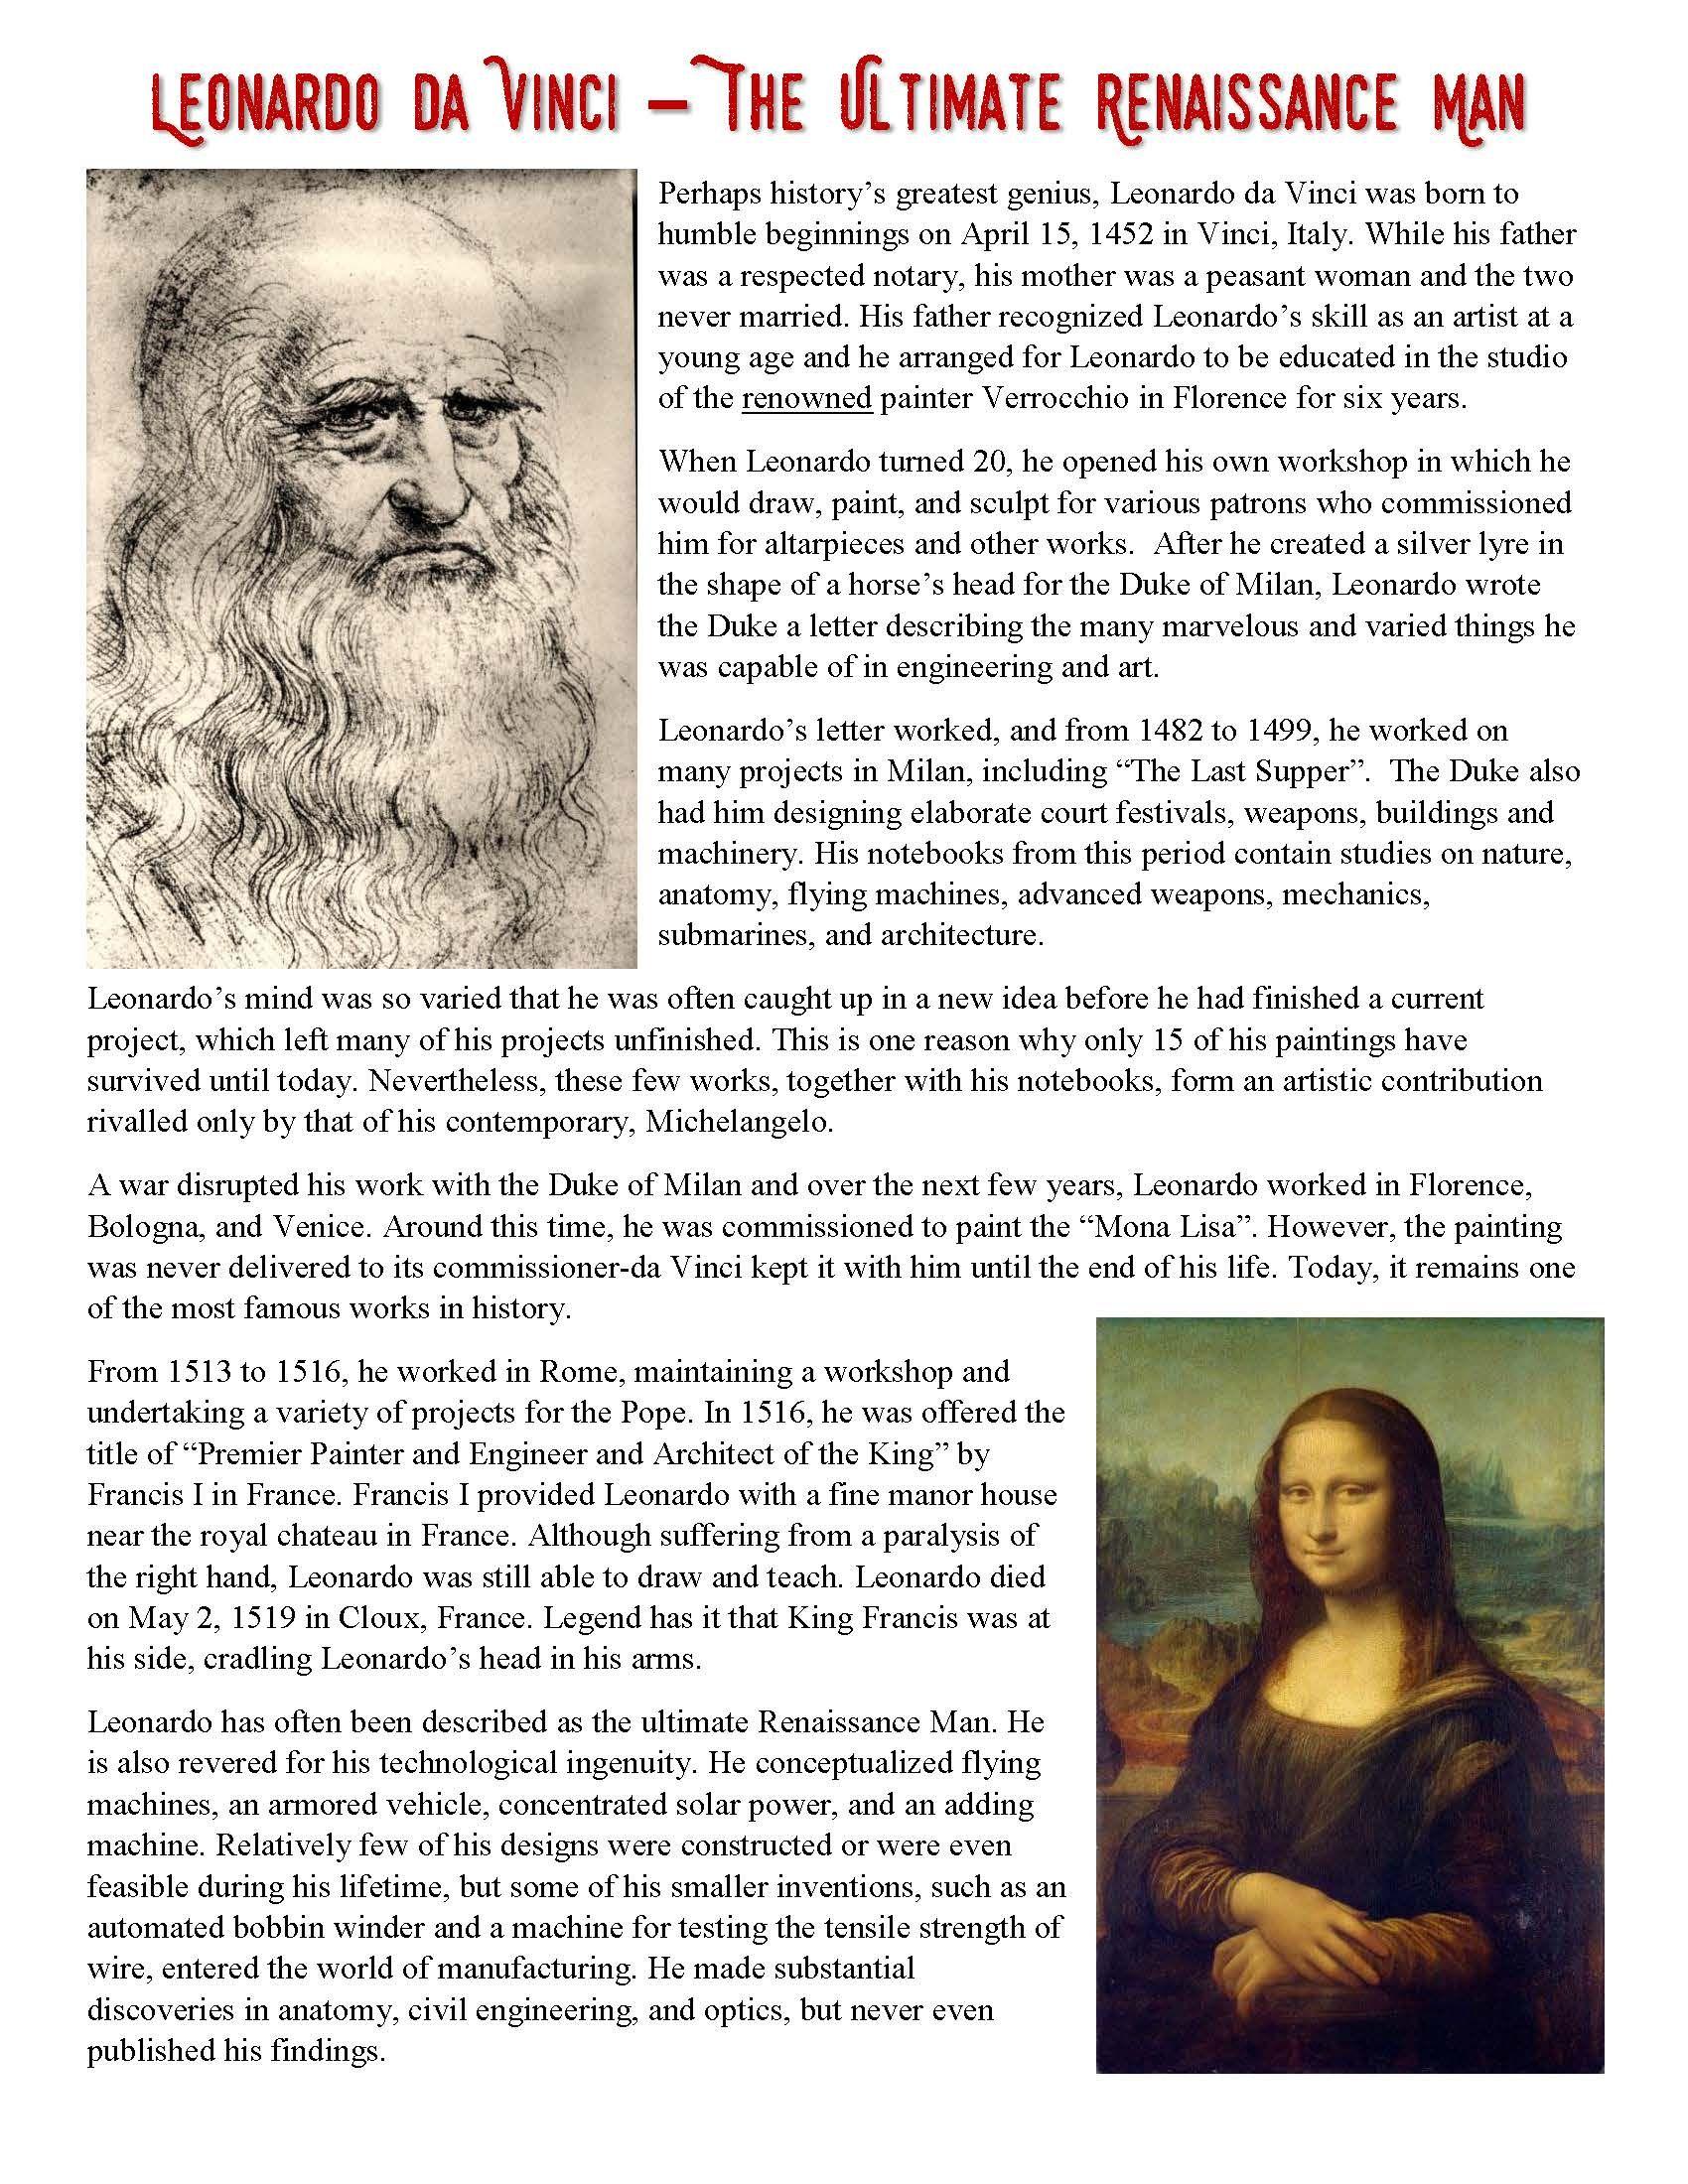 Leonardo Da Vinci Reading And Interactive Notebook